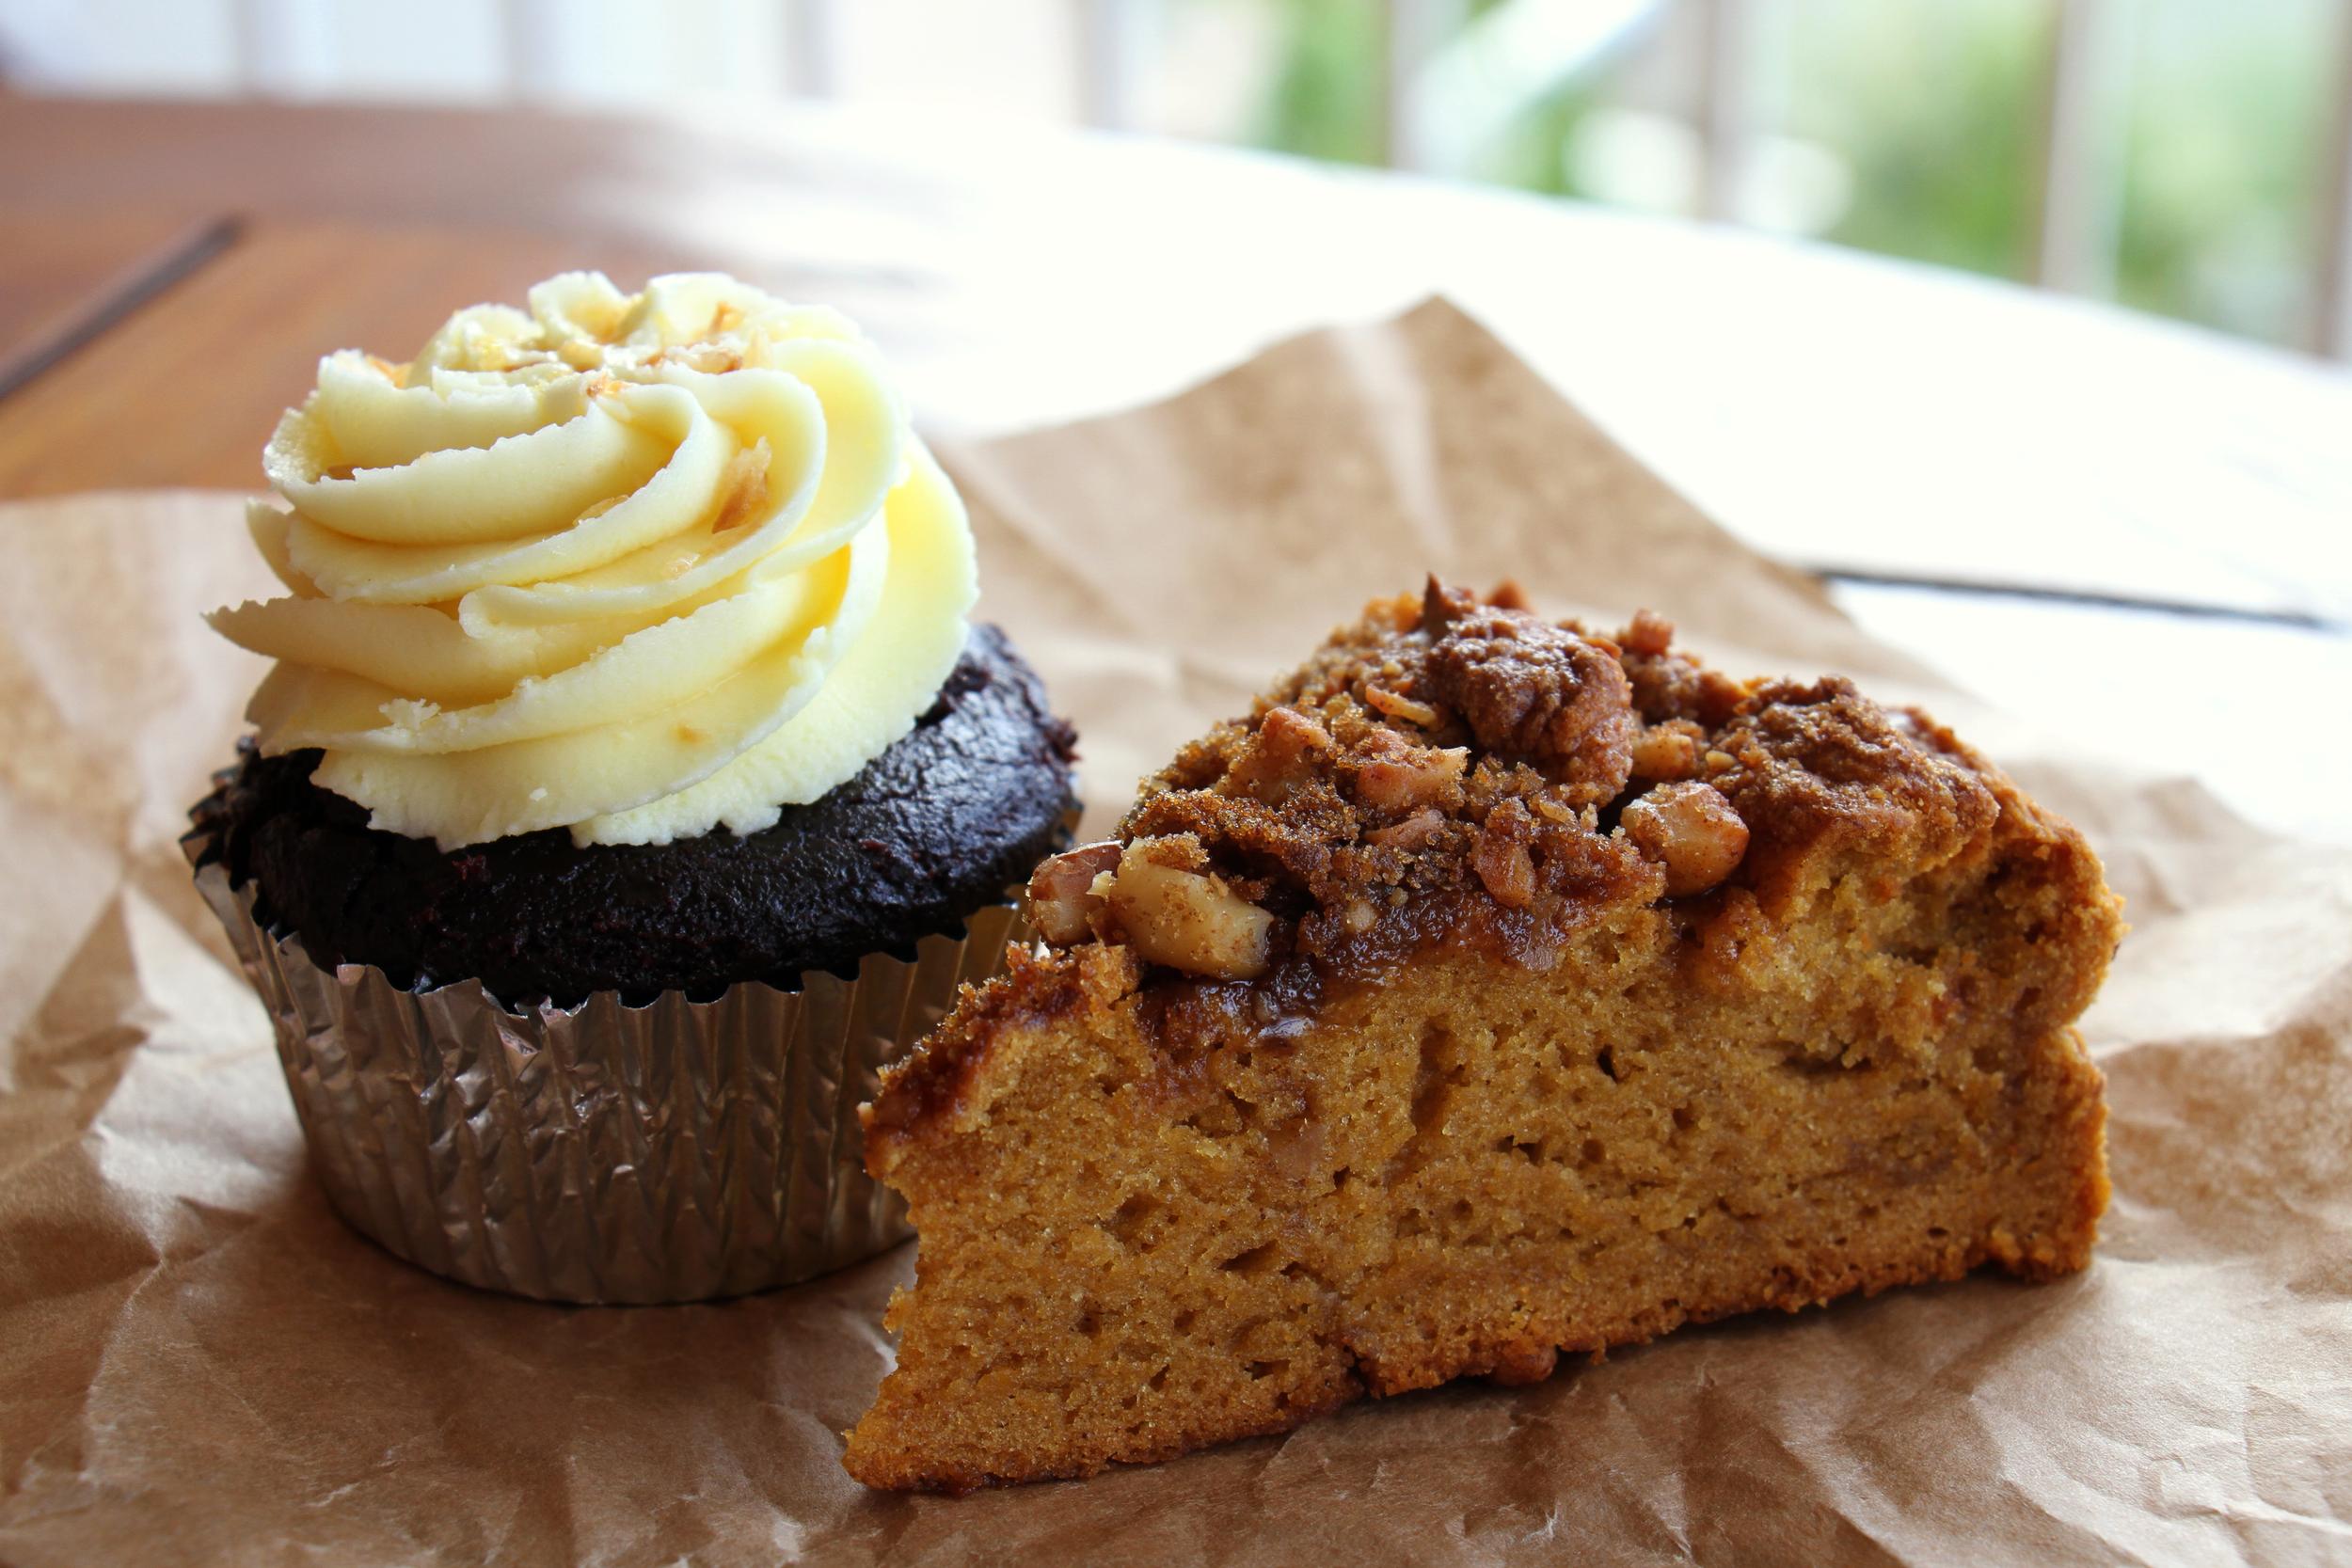 Lilikoi cupcake and coffee cake  from Maui Sugar Shop